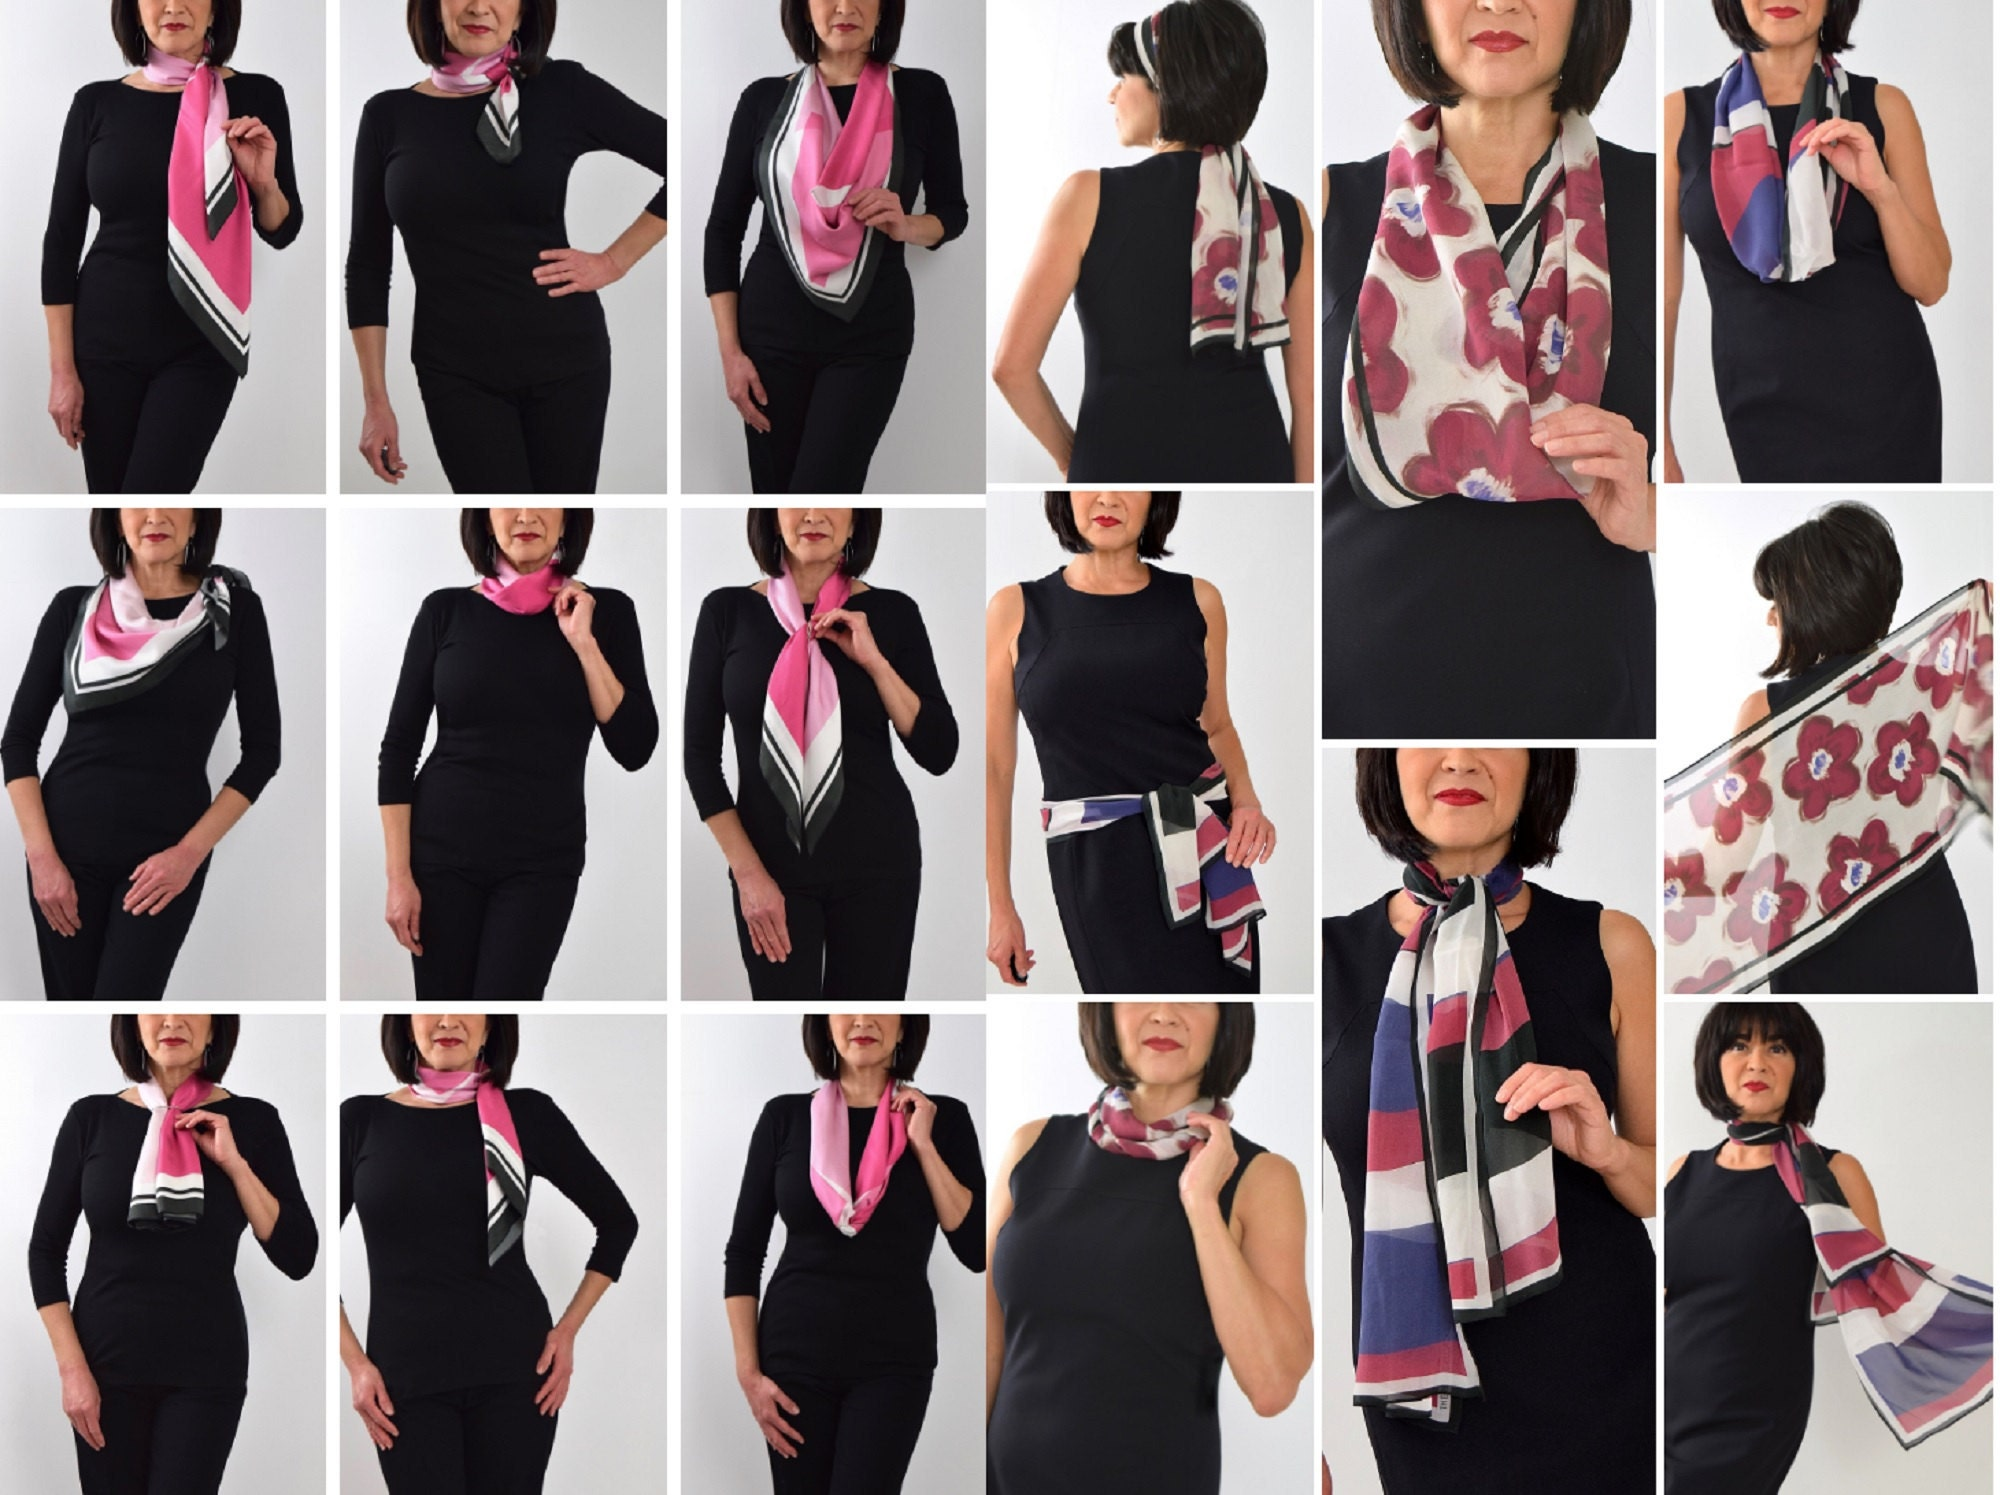 Ways to wear your scarf